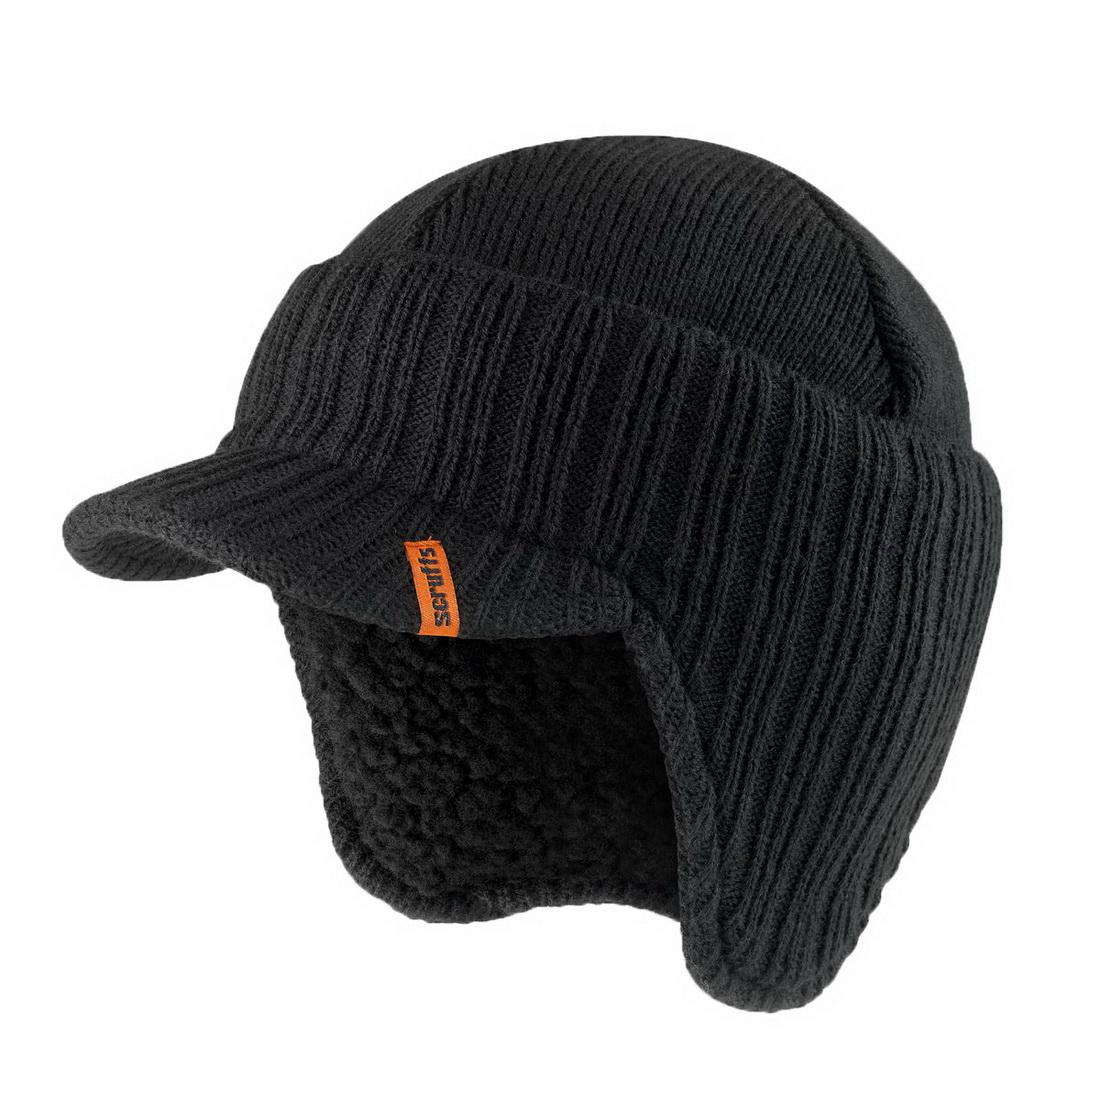 Warm Styled Wool Peaked Beanie Hat One Size Black T50986